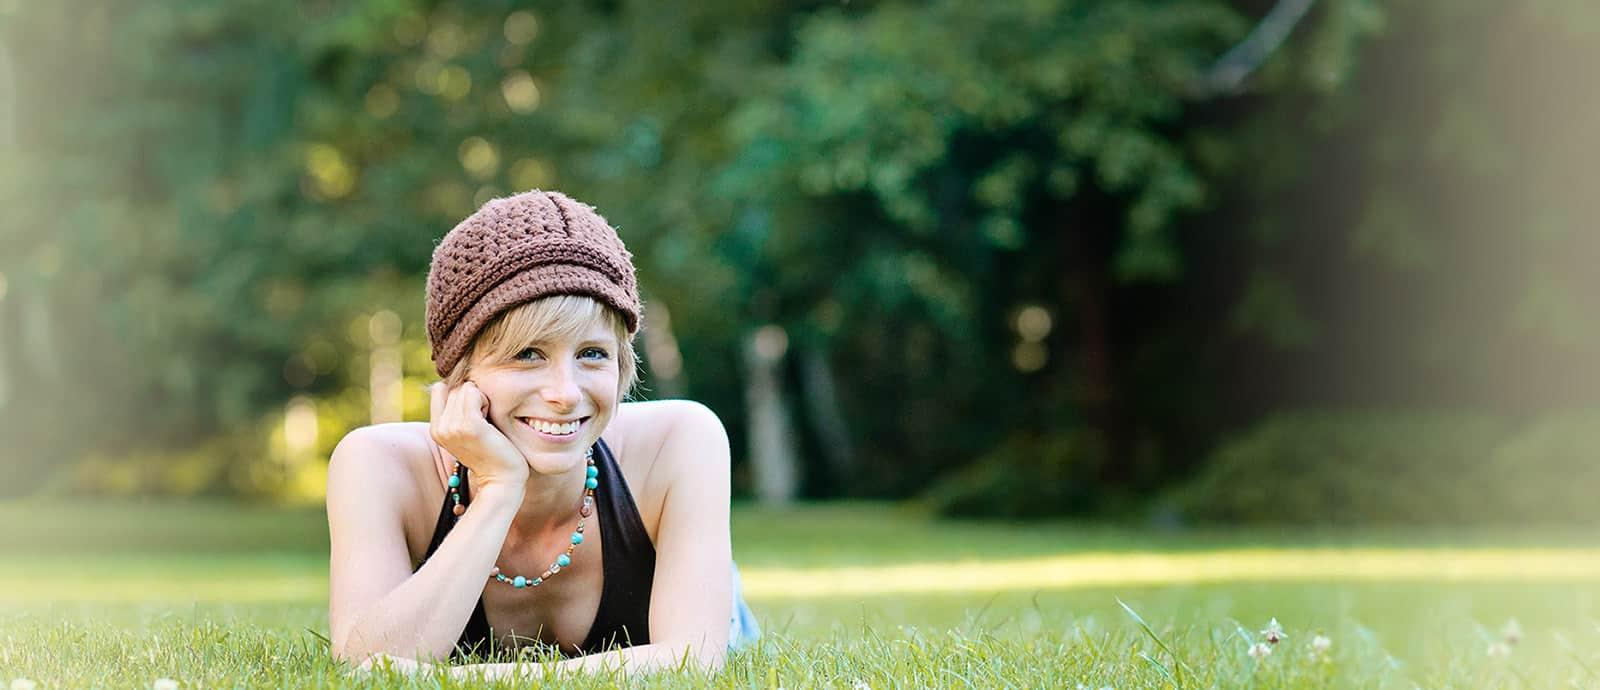 Tracy Raft lying down on grass